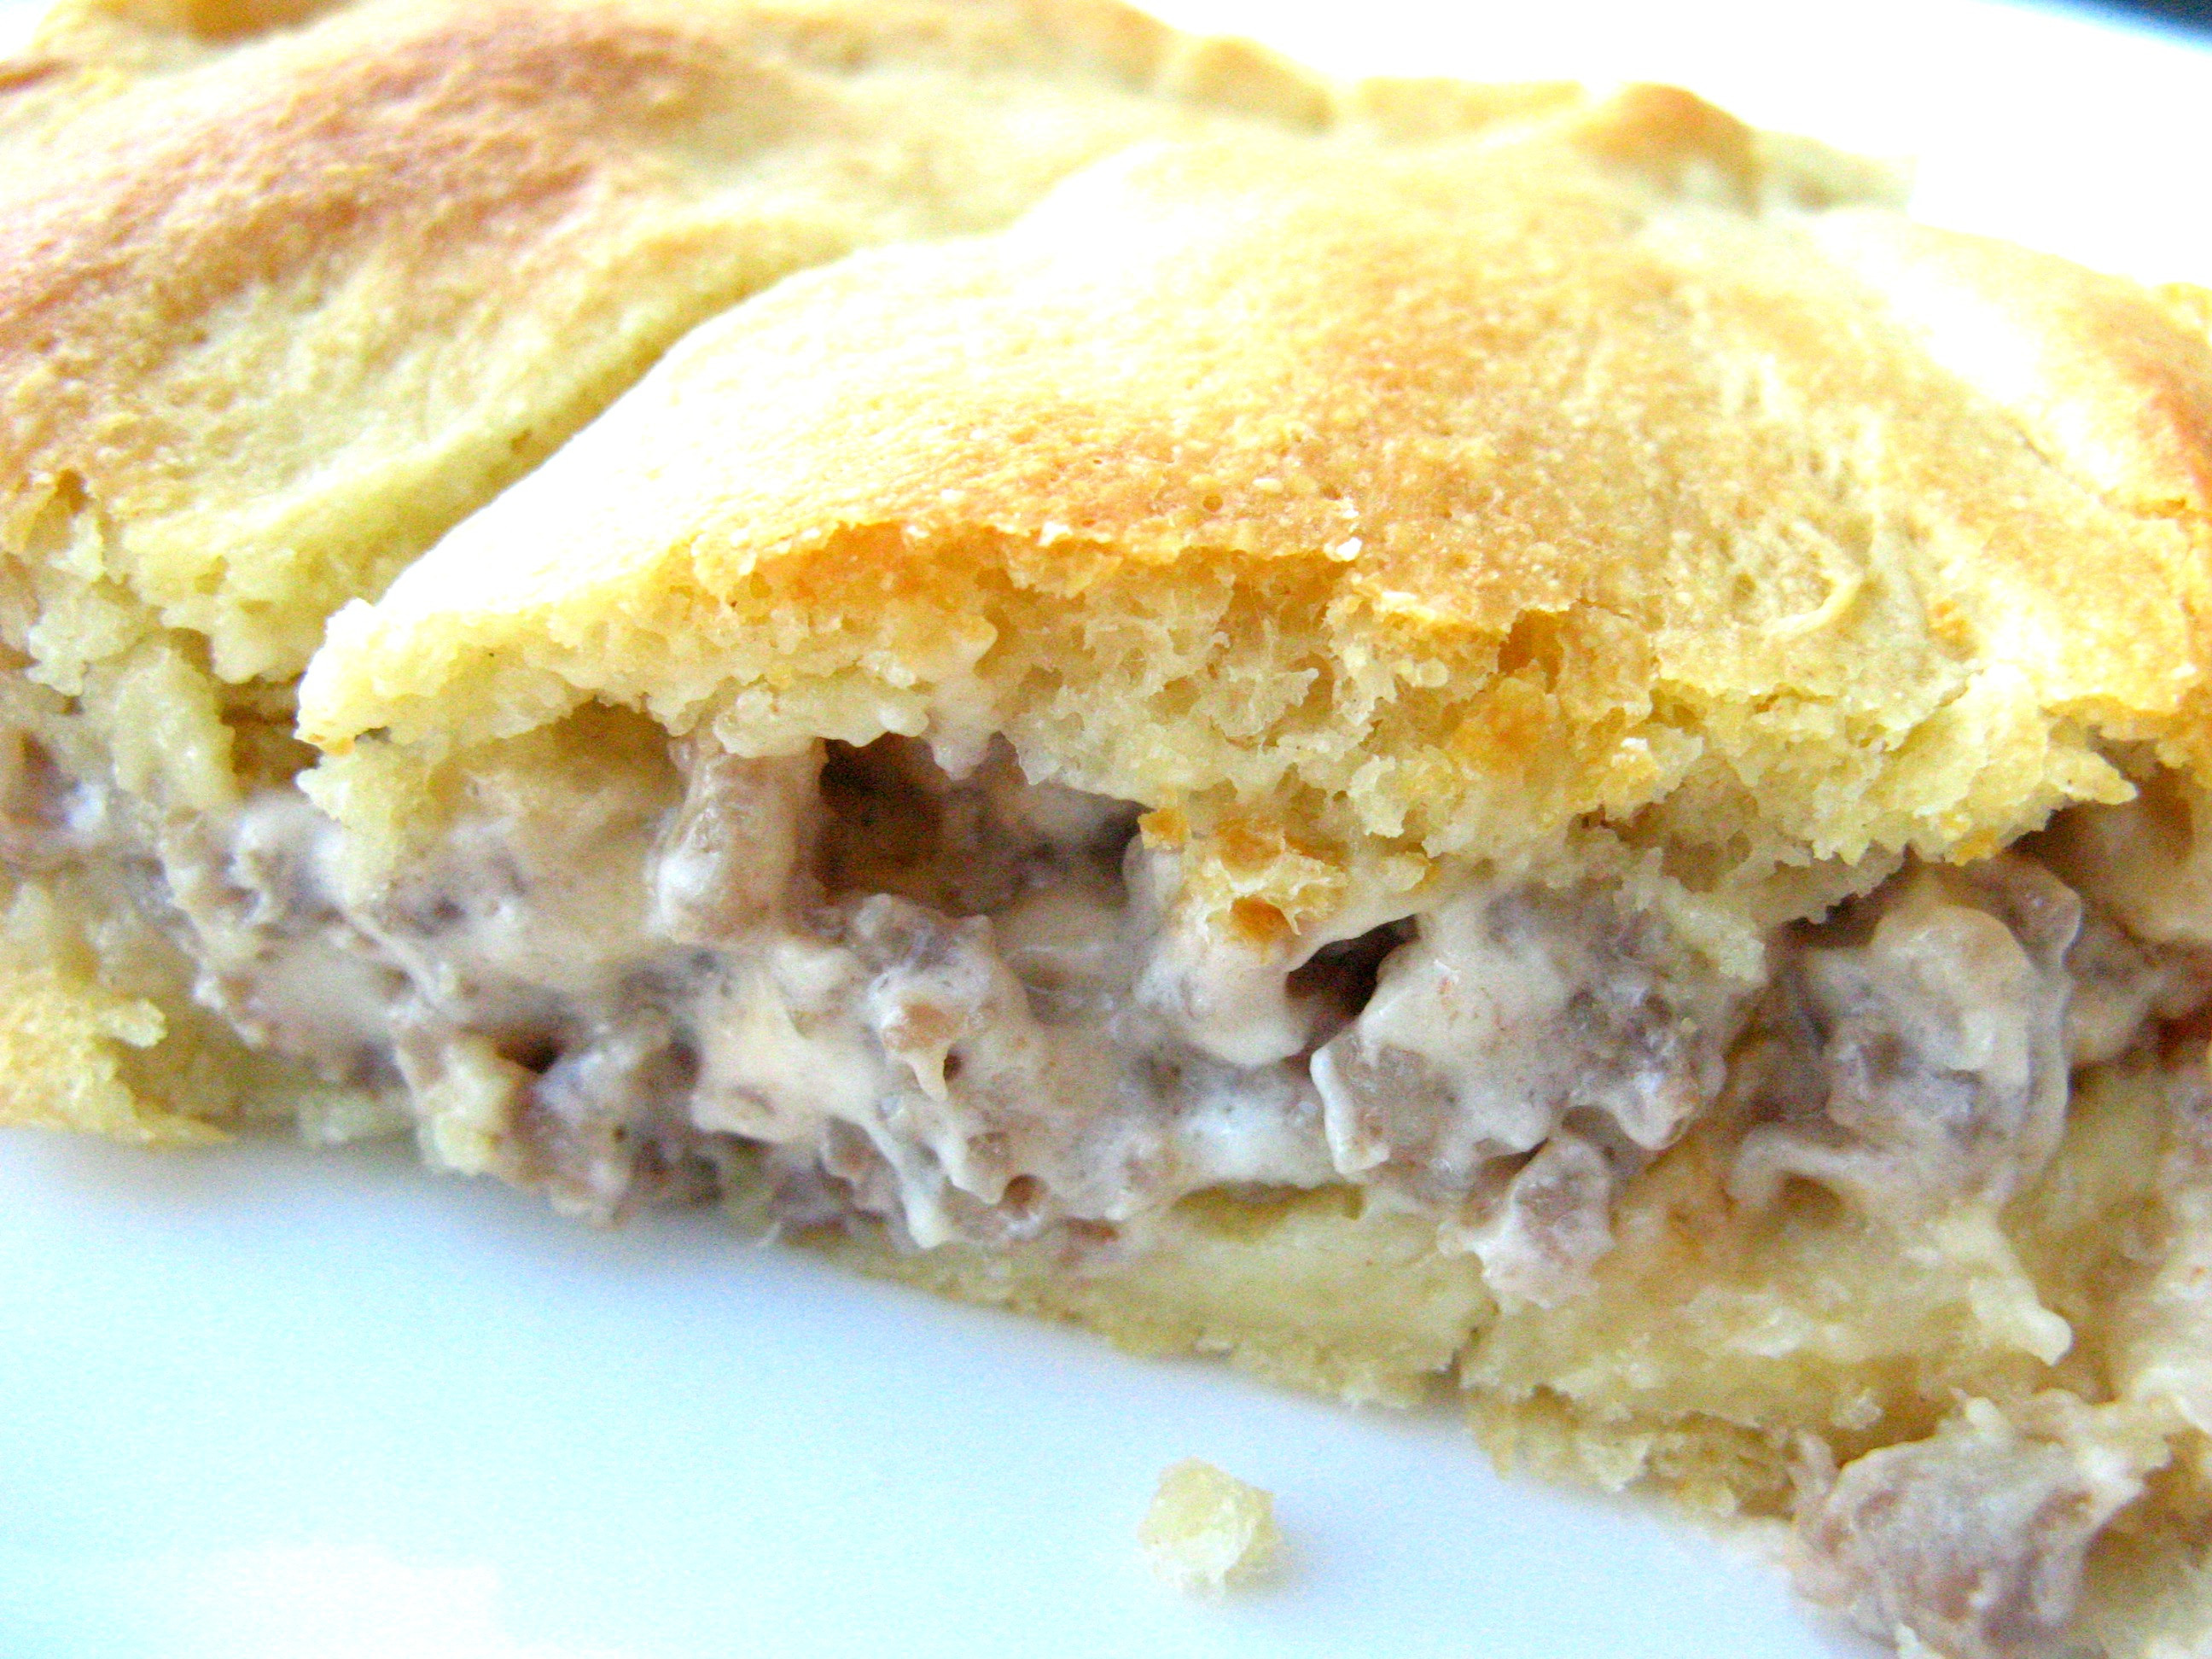 Sausage Biscuit Casserole  Sausage Biscuit Casserole